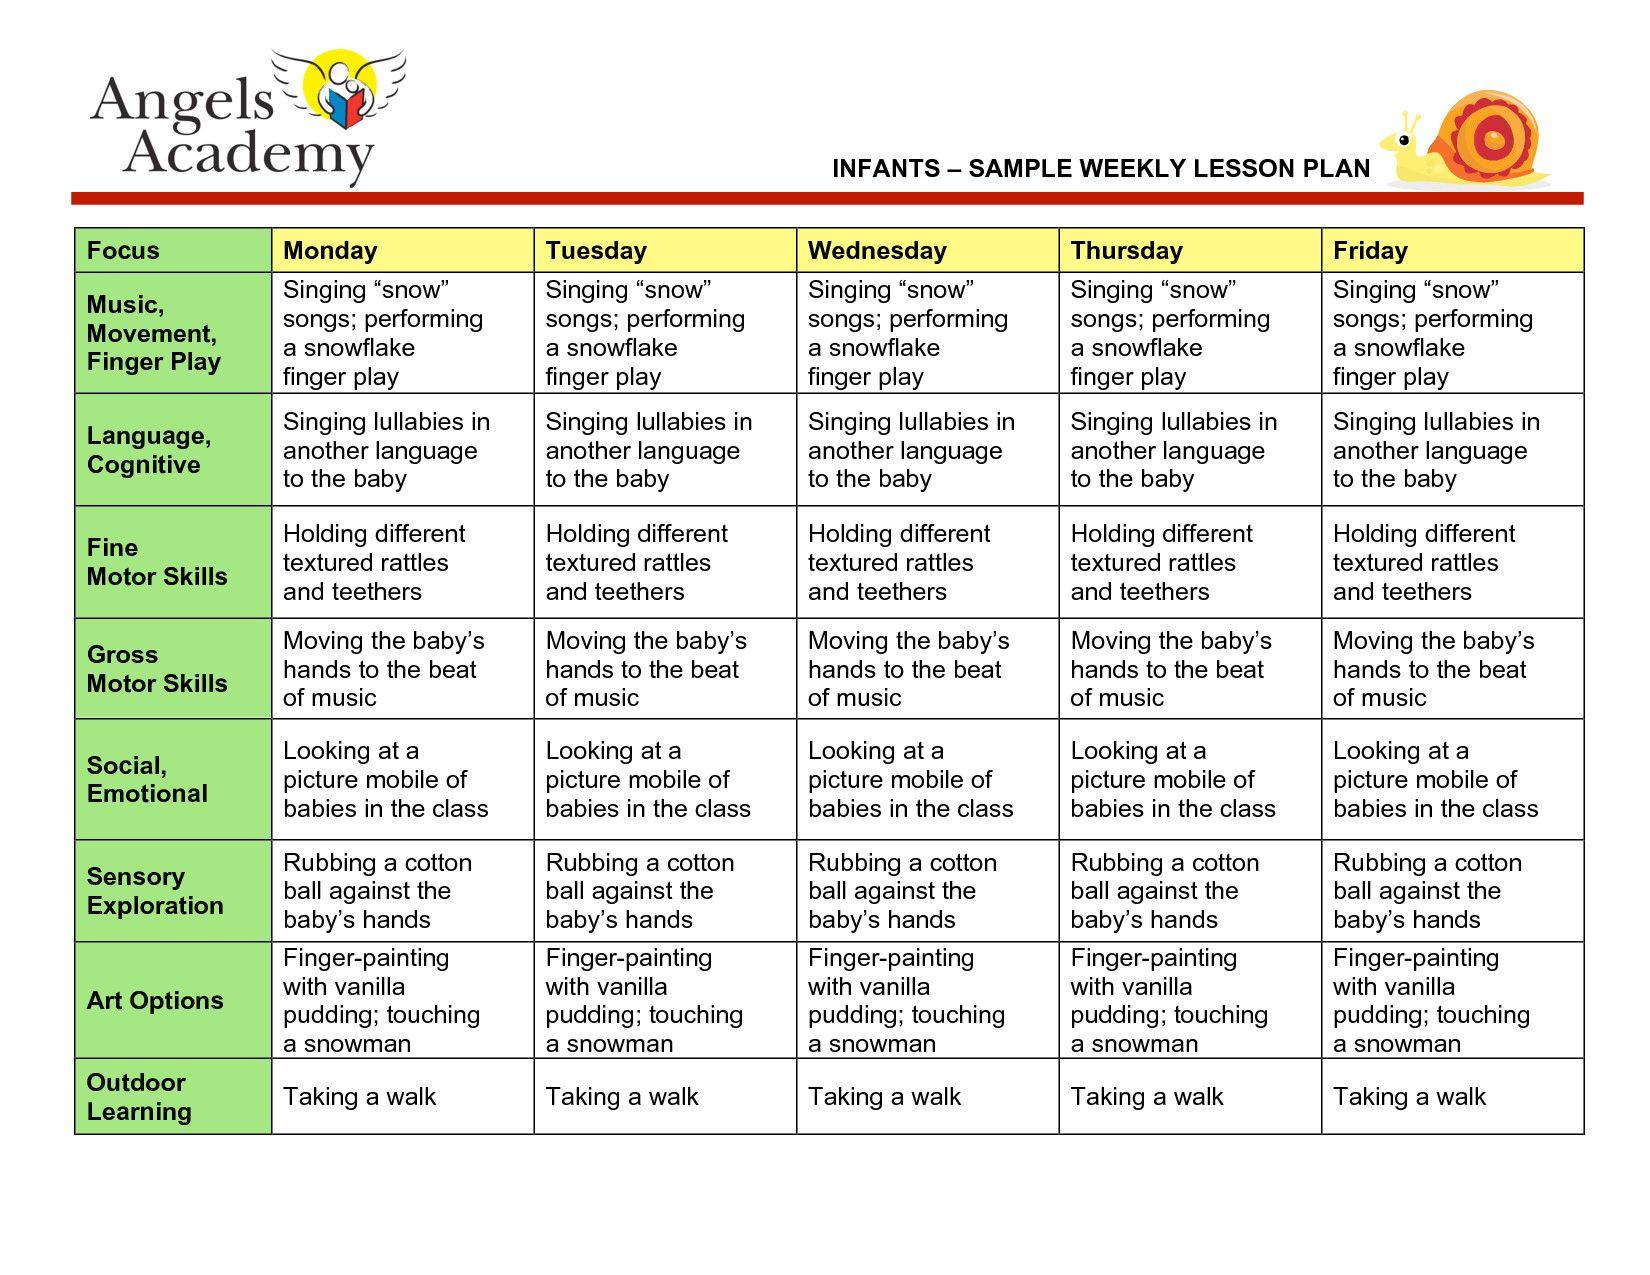 Week Long Lesson Plan Template New Blank Lesson Plan Template Infant Lesson Plans Curriculum Lesson Plans Lesson Plans For Toddlers